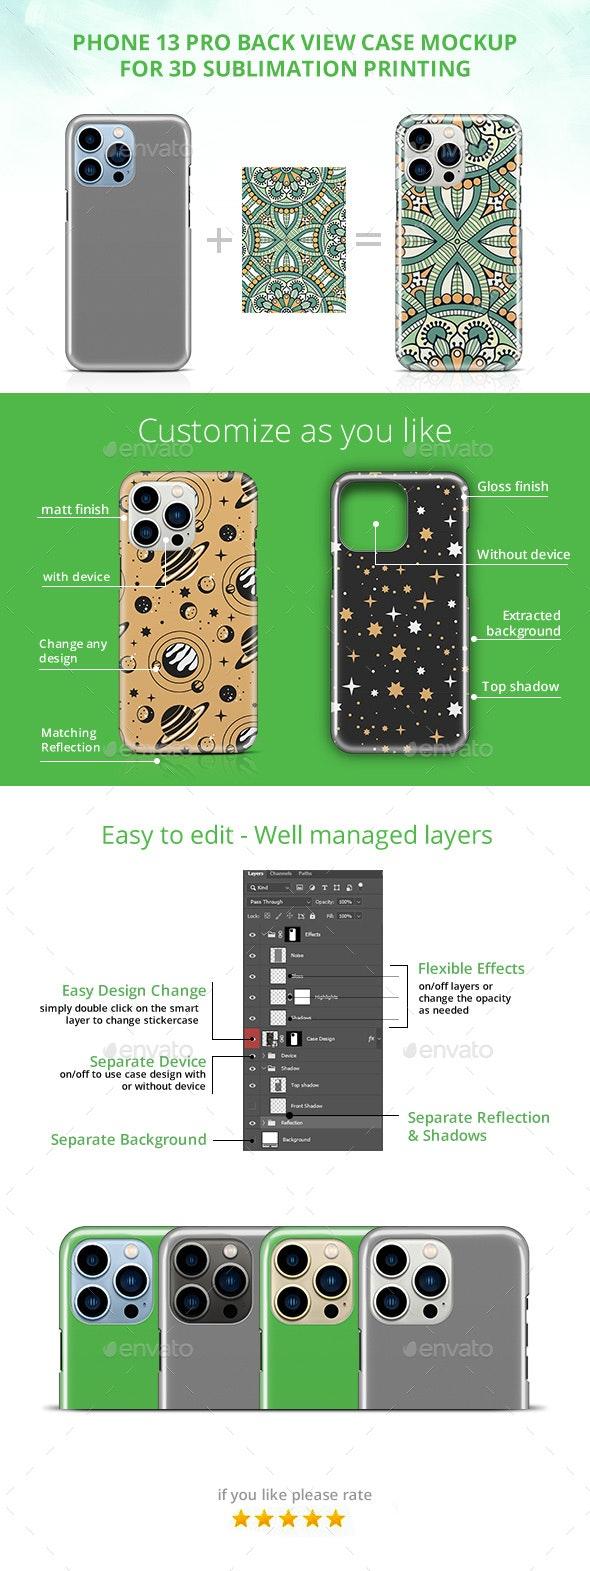 Phone 13 Pro 3d Case Design Mockup- Back View - Product Mock-Ups Graphics